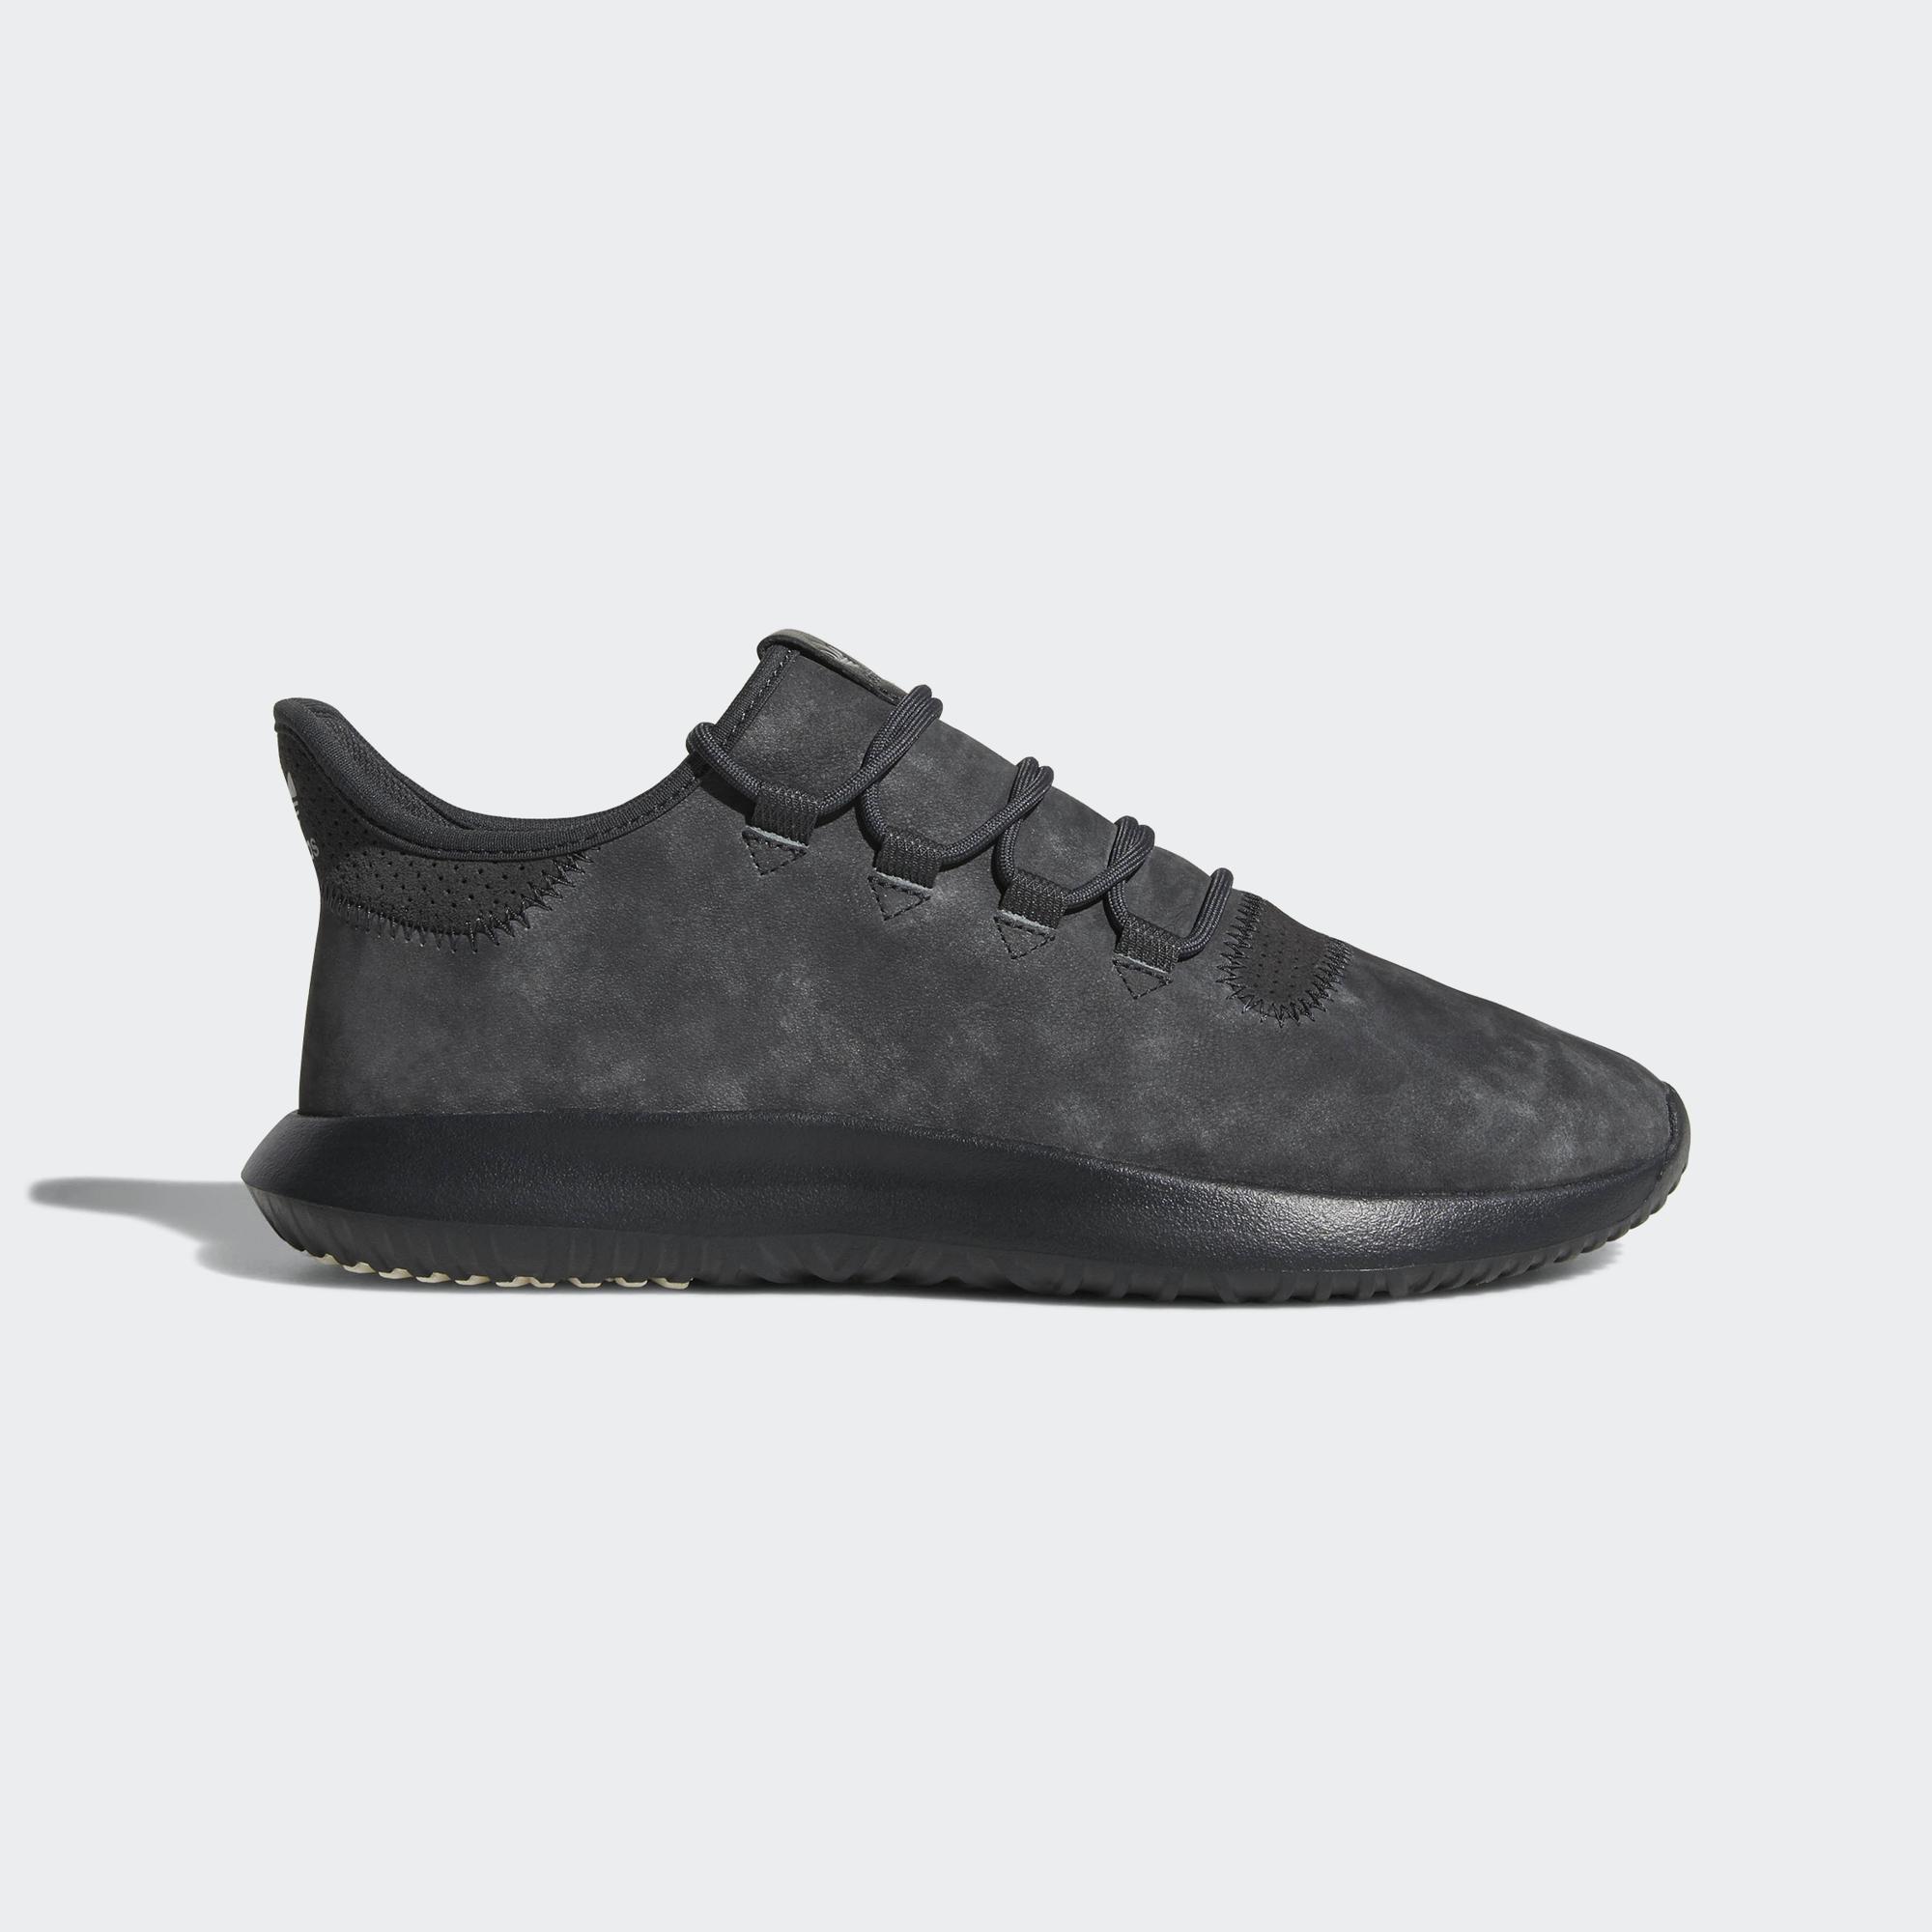 Adidas Originals Schuhe Tubular Shadow